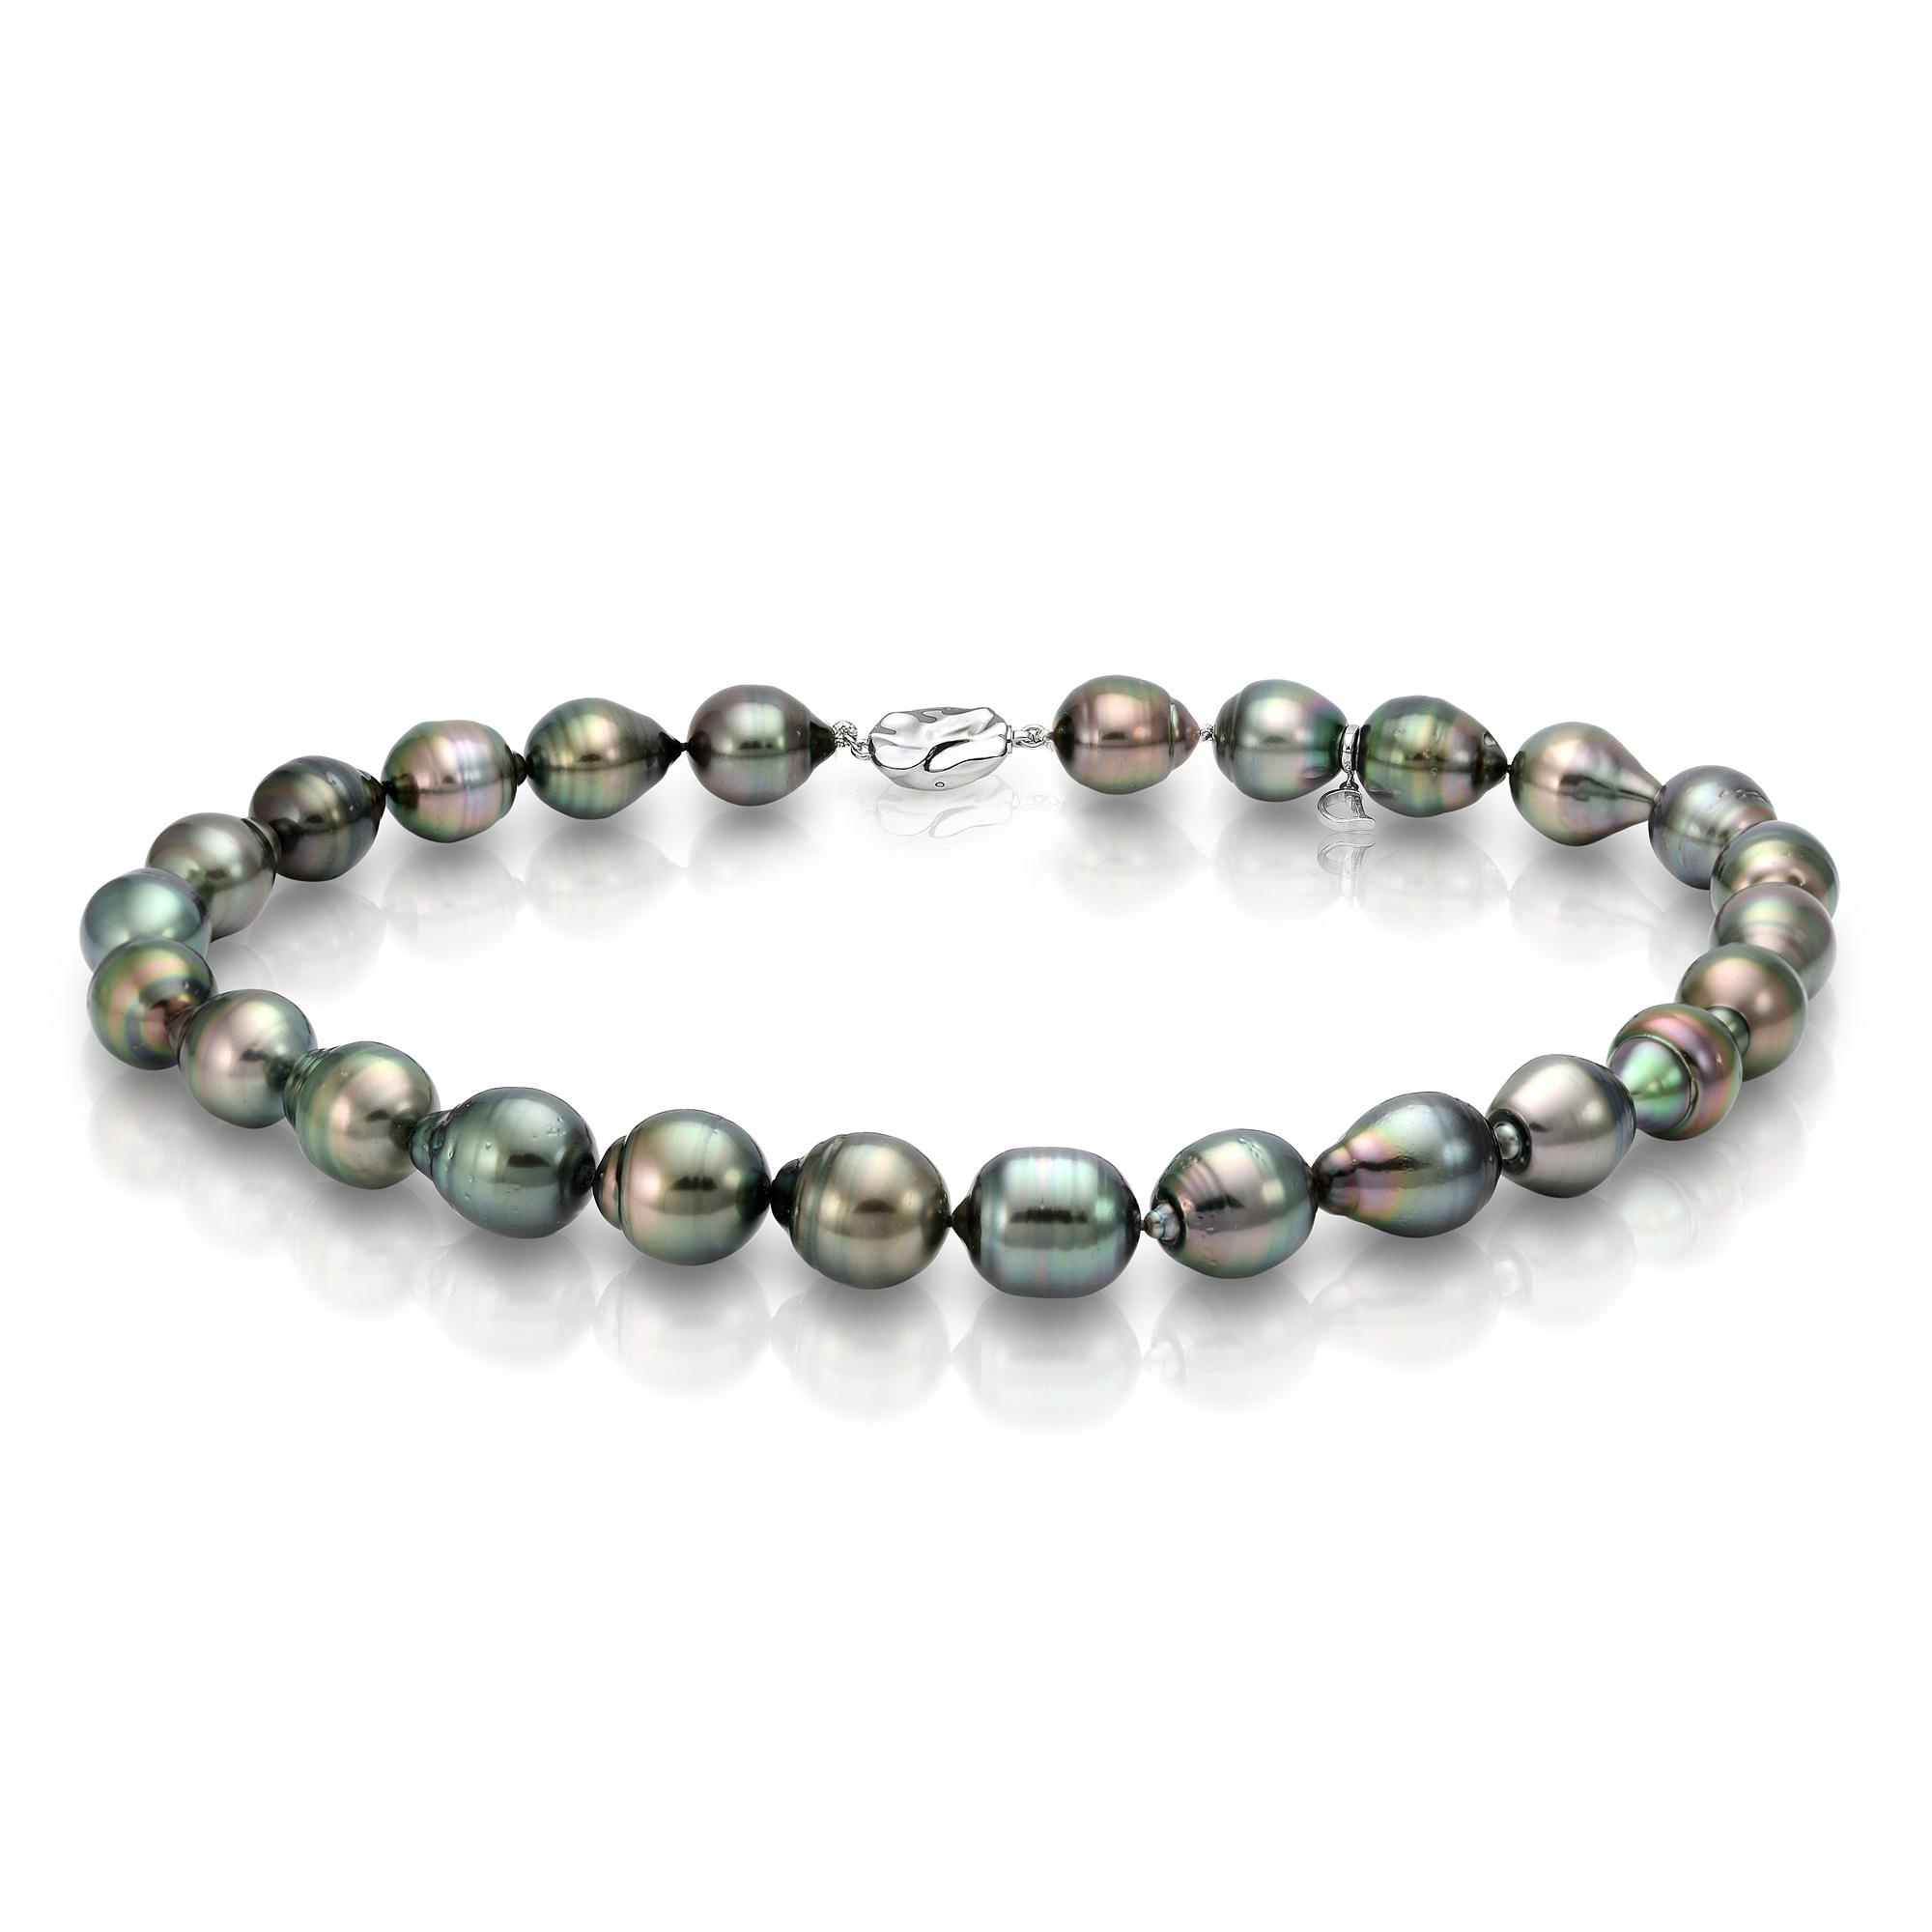 "Ожерелье из черного морского Таитянского жемчуга ""Барокко"" 12,1-14,6 мм"